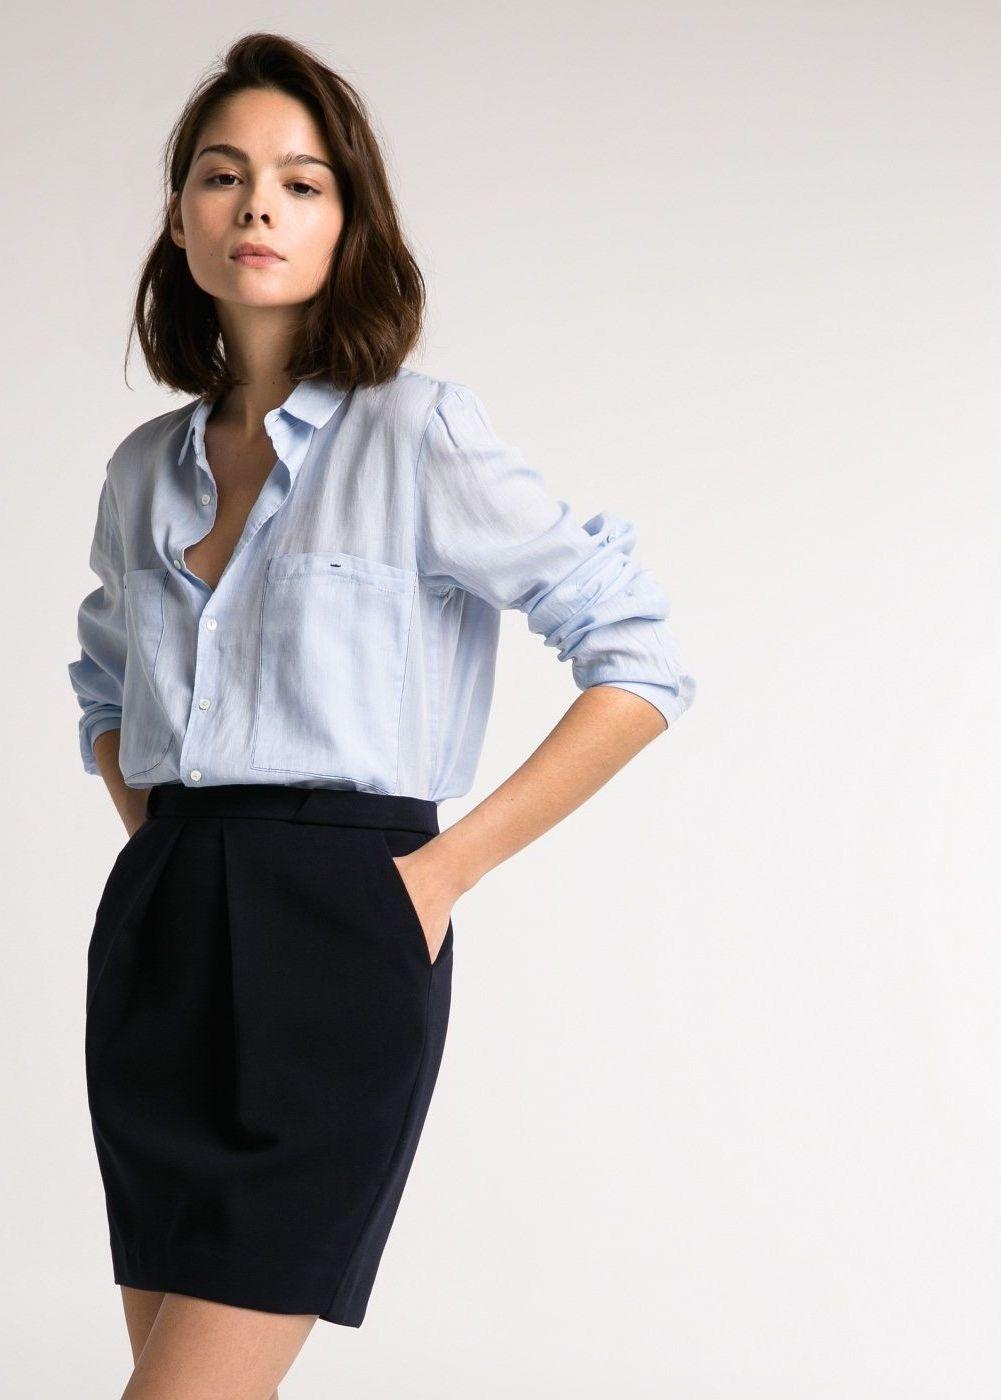 Summer Workwear Wardrobe For Women 2019 Stylefavourite Com